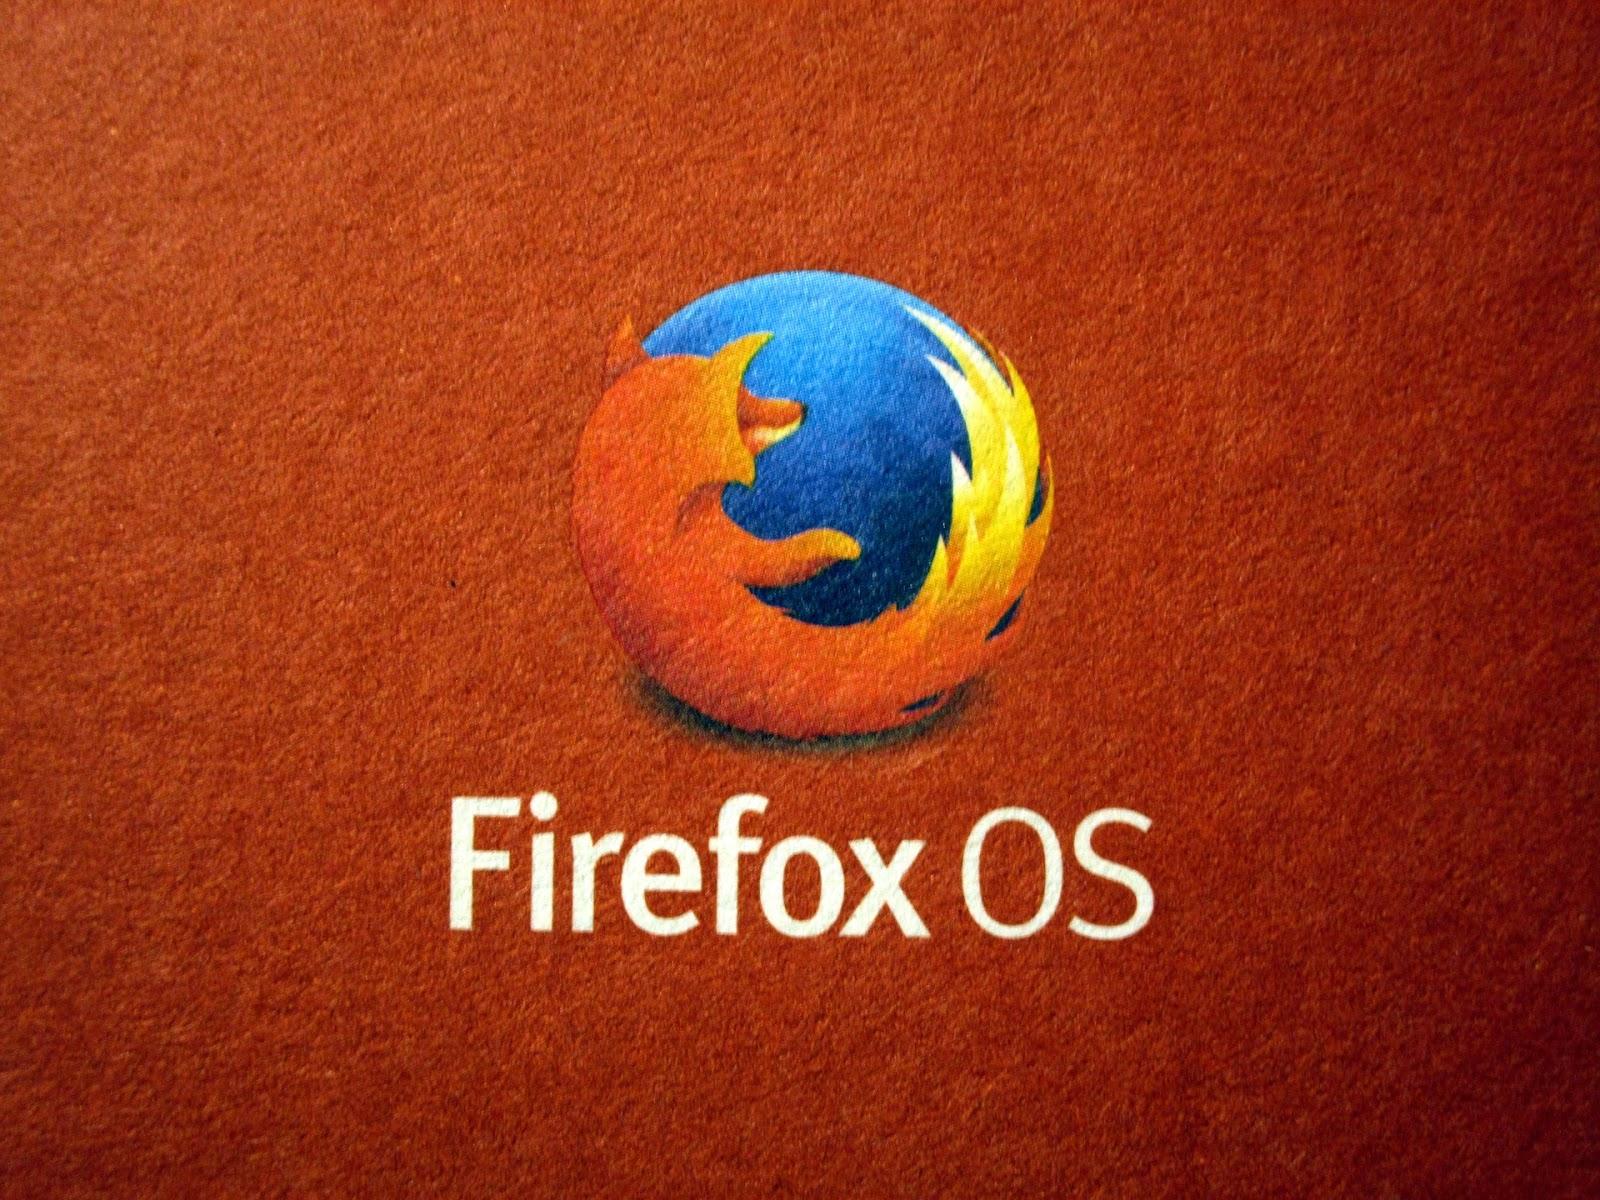 Firefox update fixes critical security vulnerability - E Hacking News